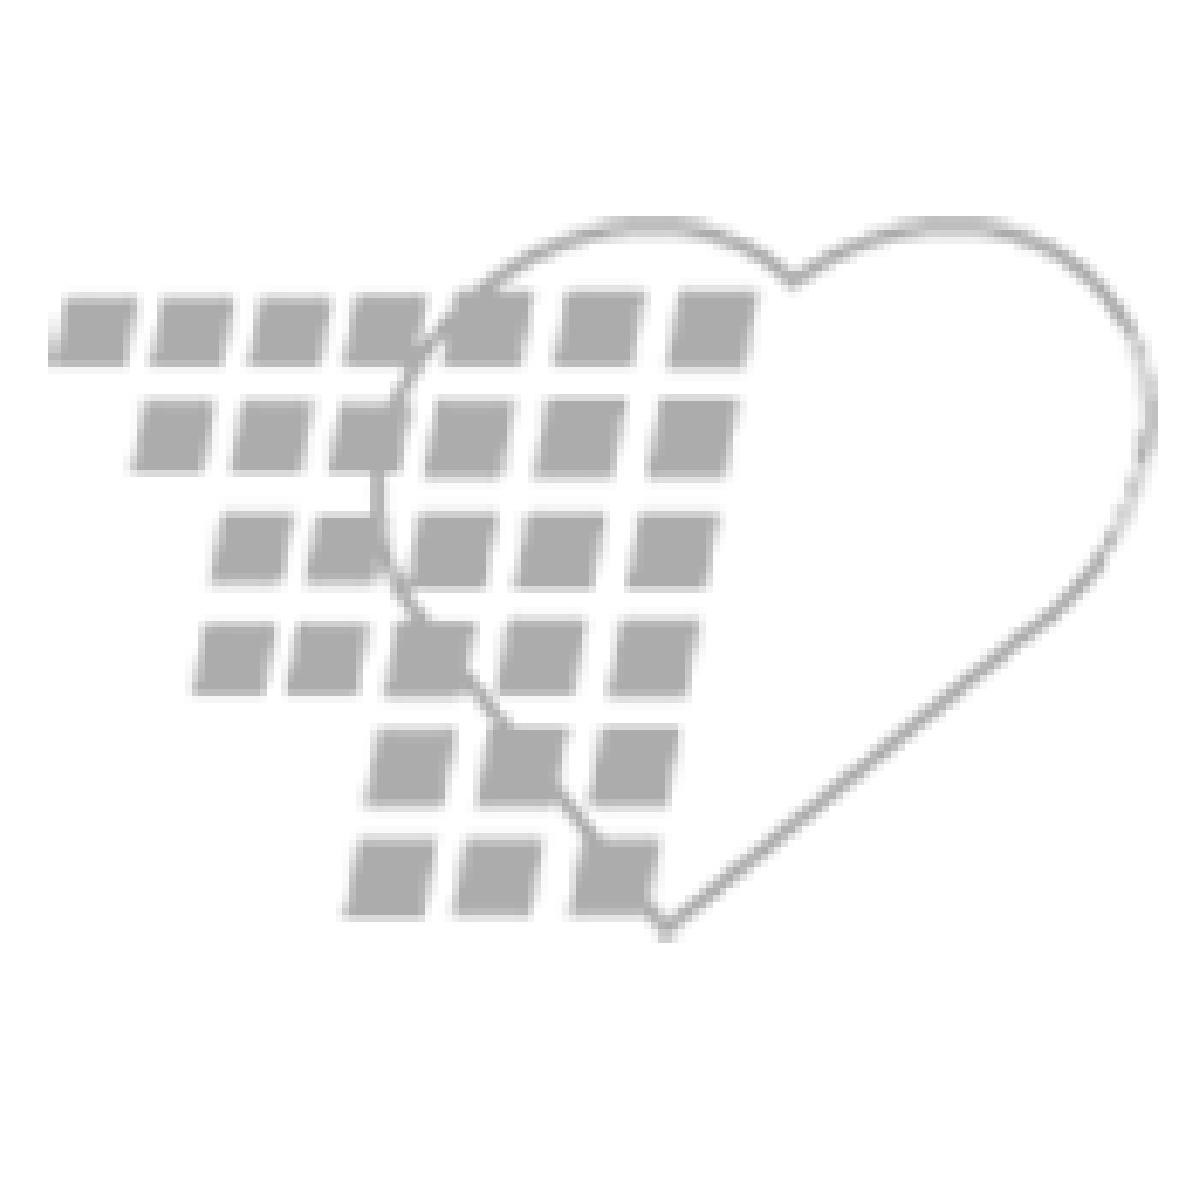 "06-82-5781 BD Eclipse 3mL w/ Detachable Needle, 25g x 5/8"", 50/Bx"